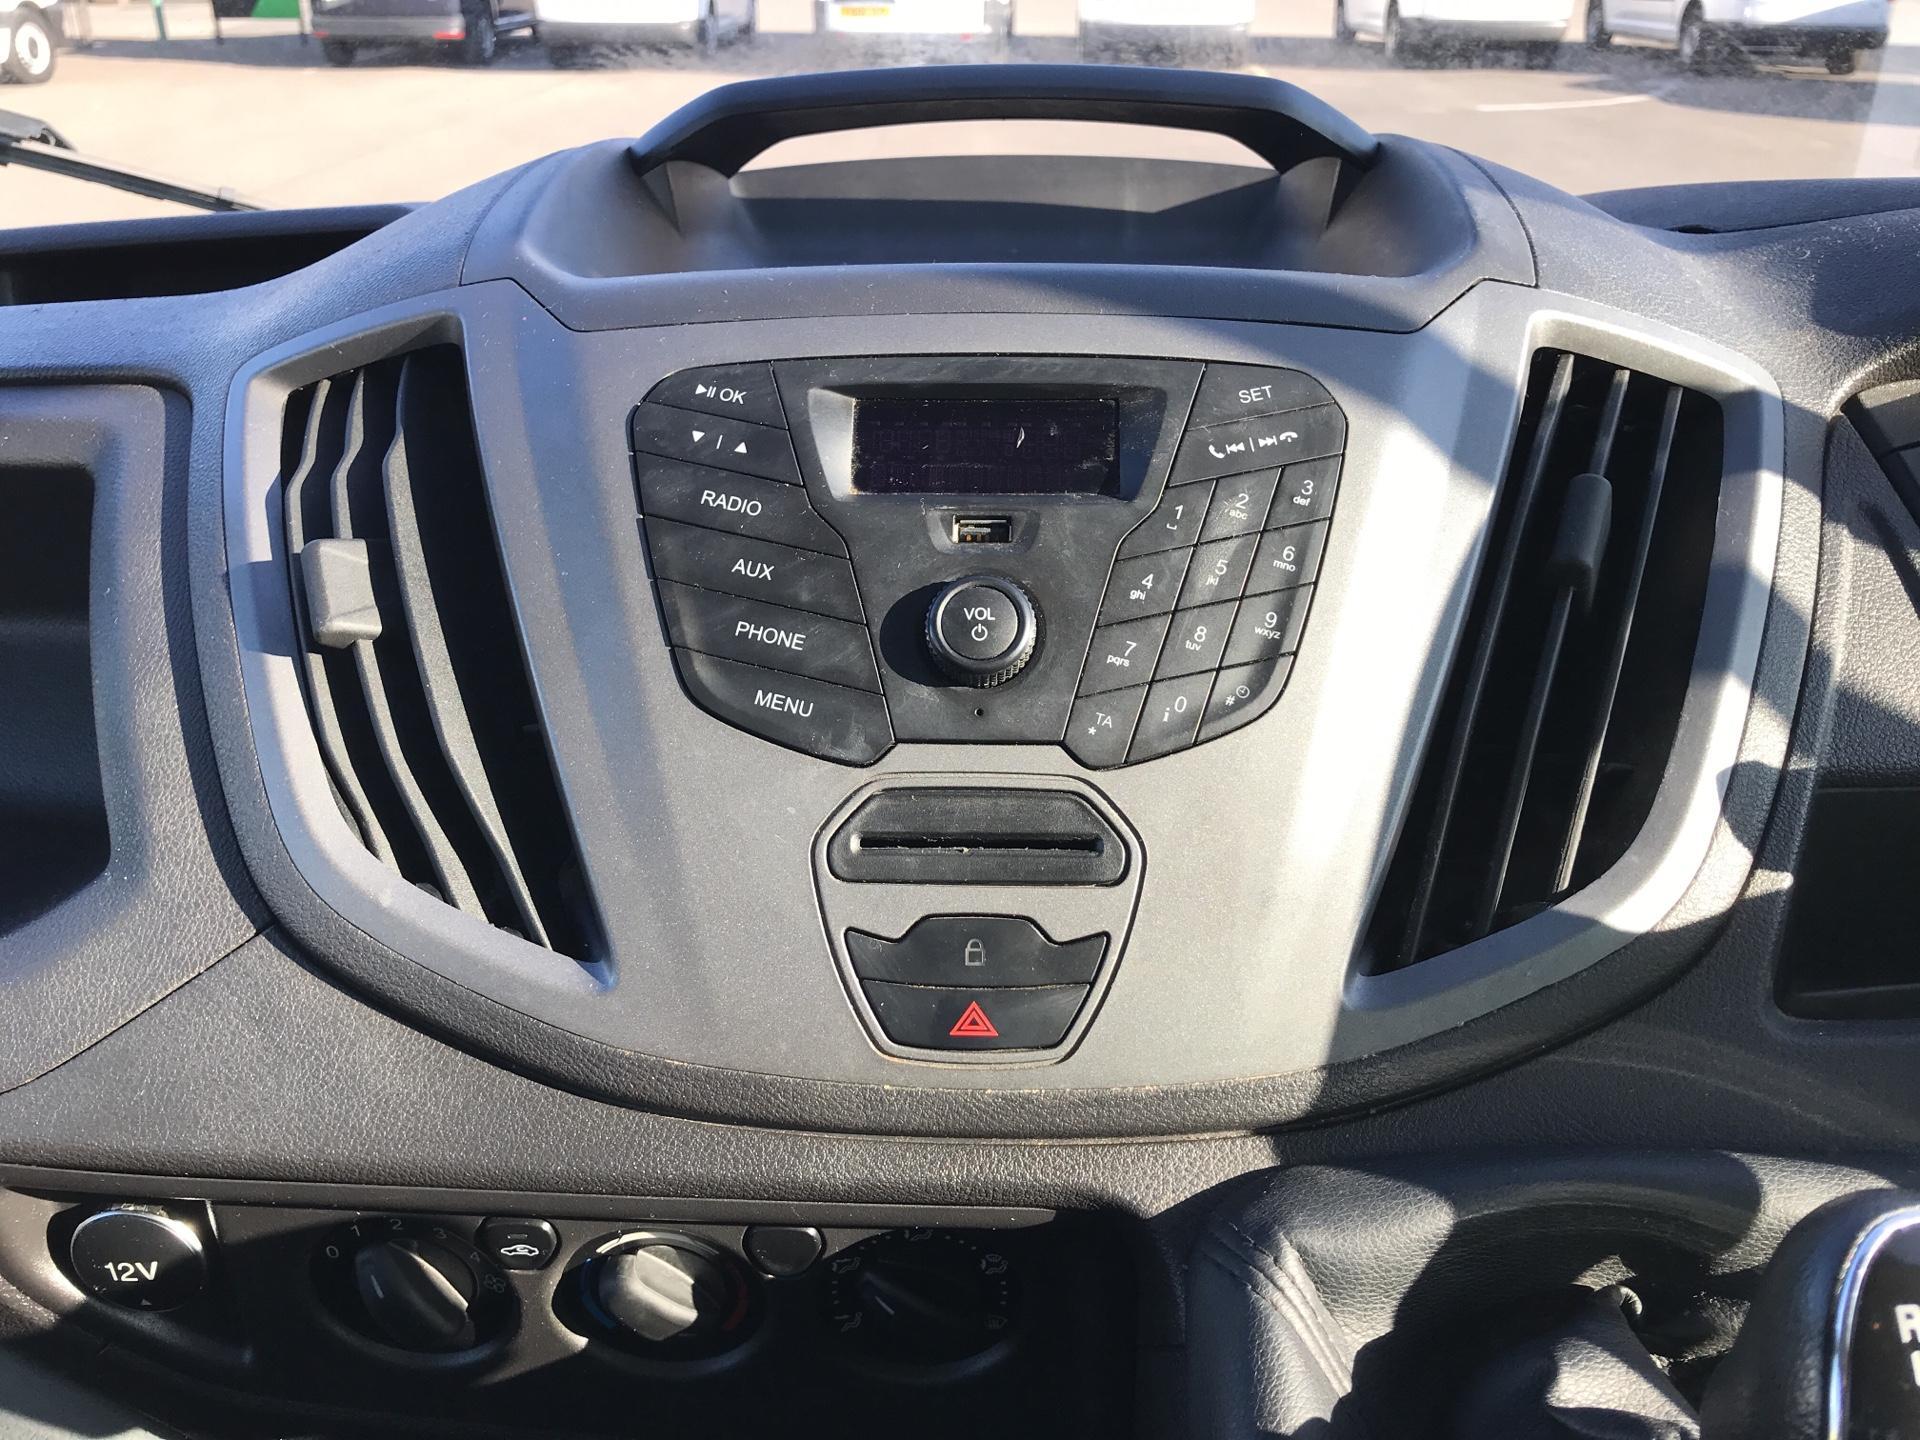 2016 Ford Transit 2.2 Tdci 125Ps LWB Dropside Van Euro 5 (FH65DYJ) Image 10